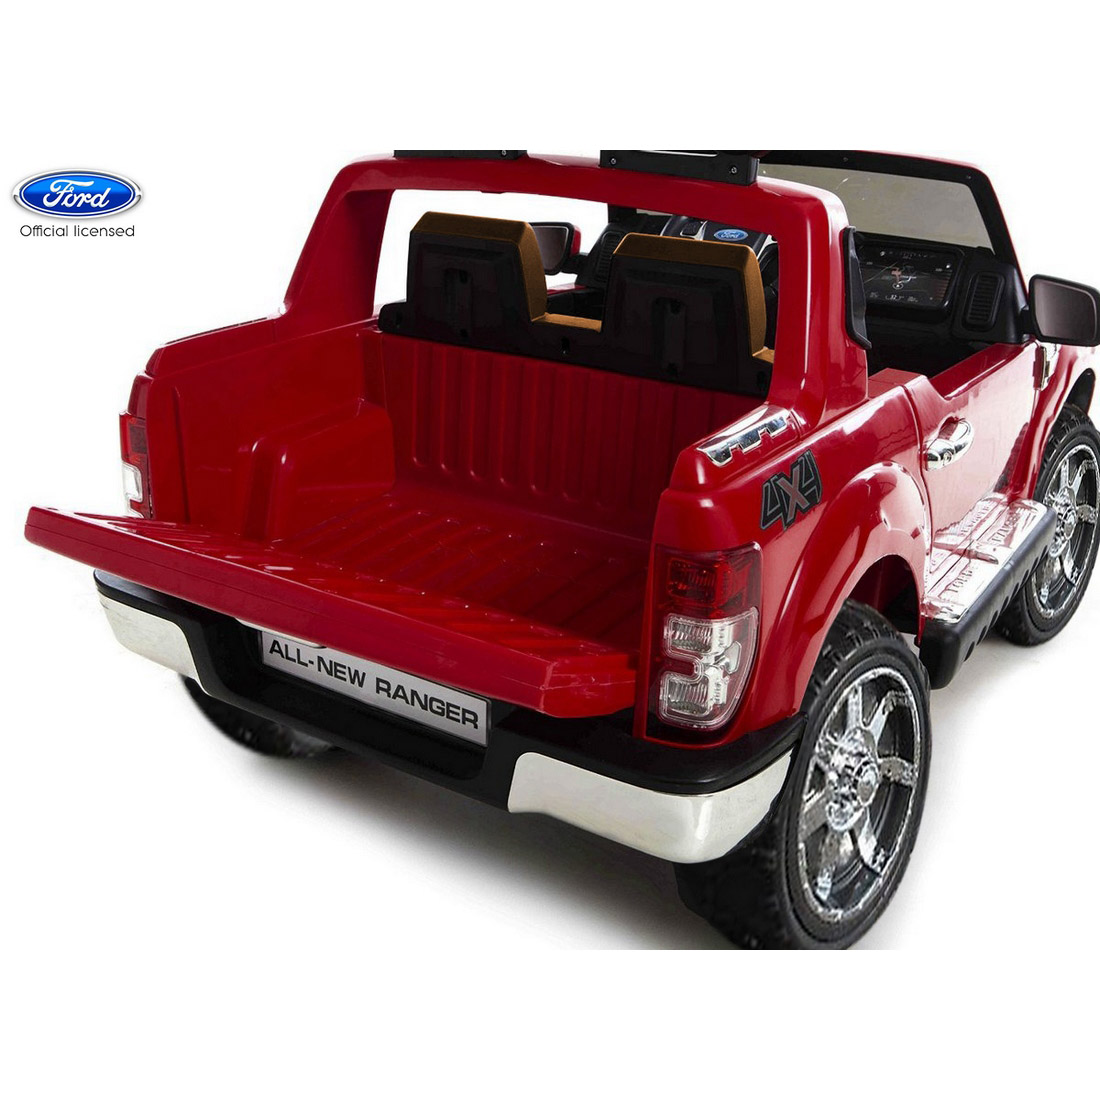 электромобиль форд 150 #11